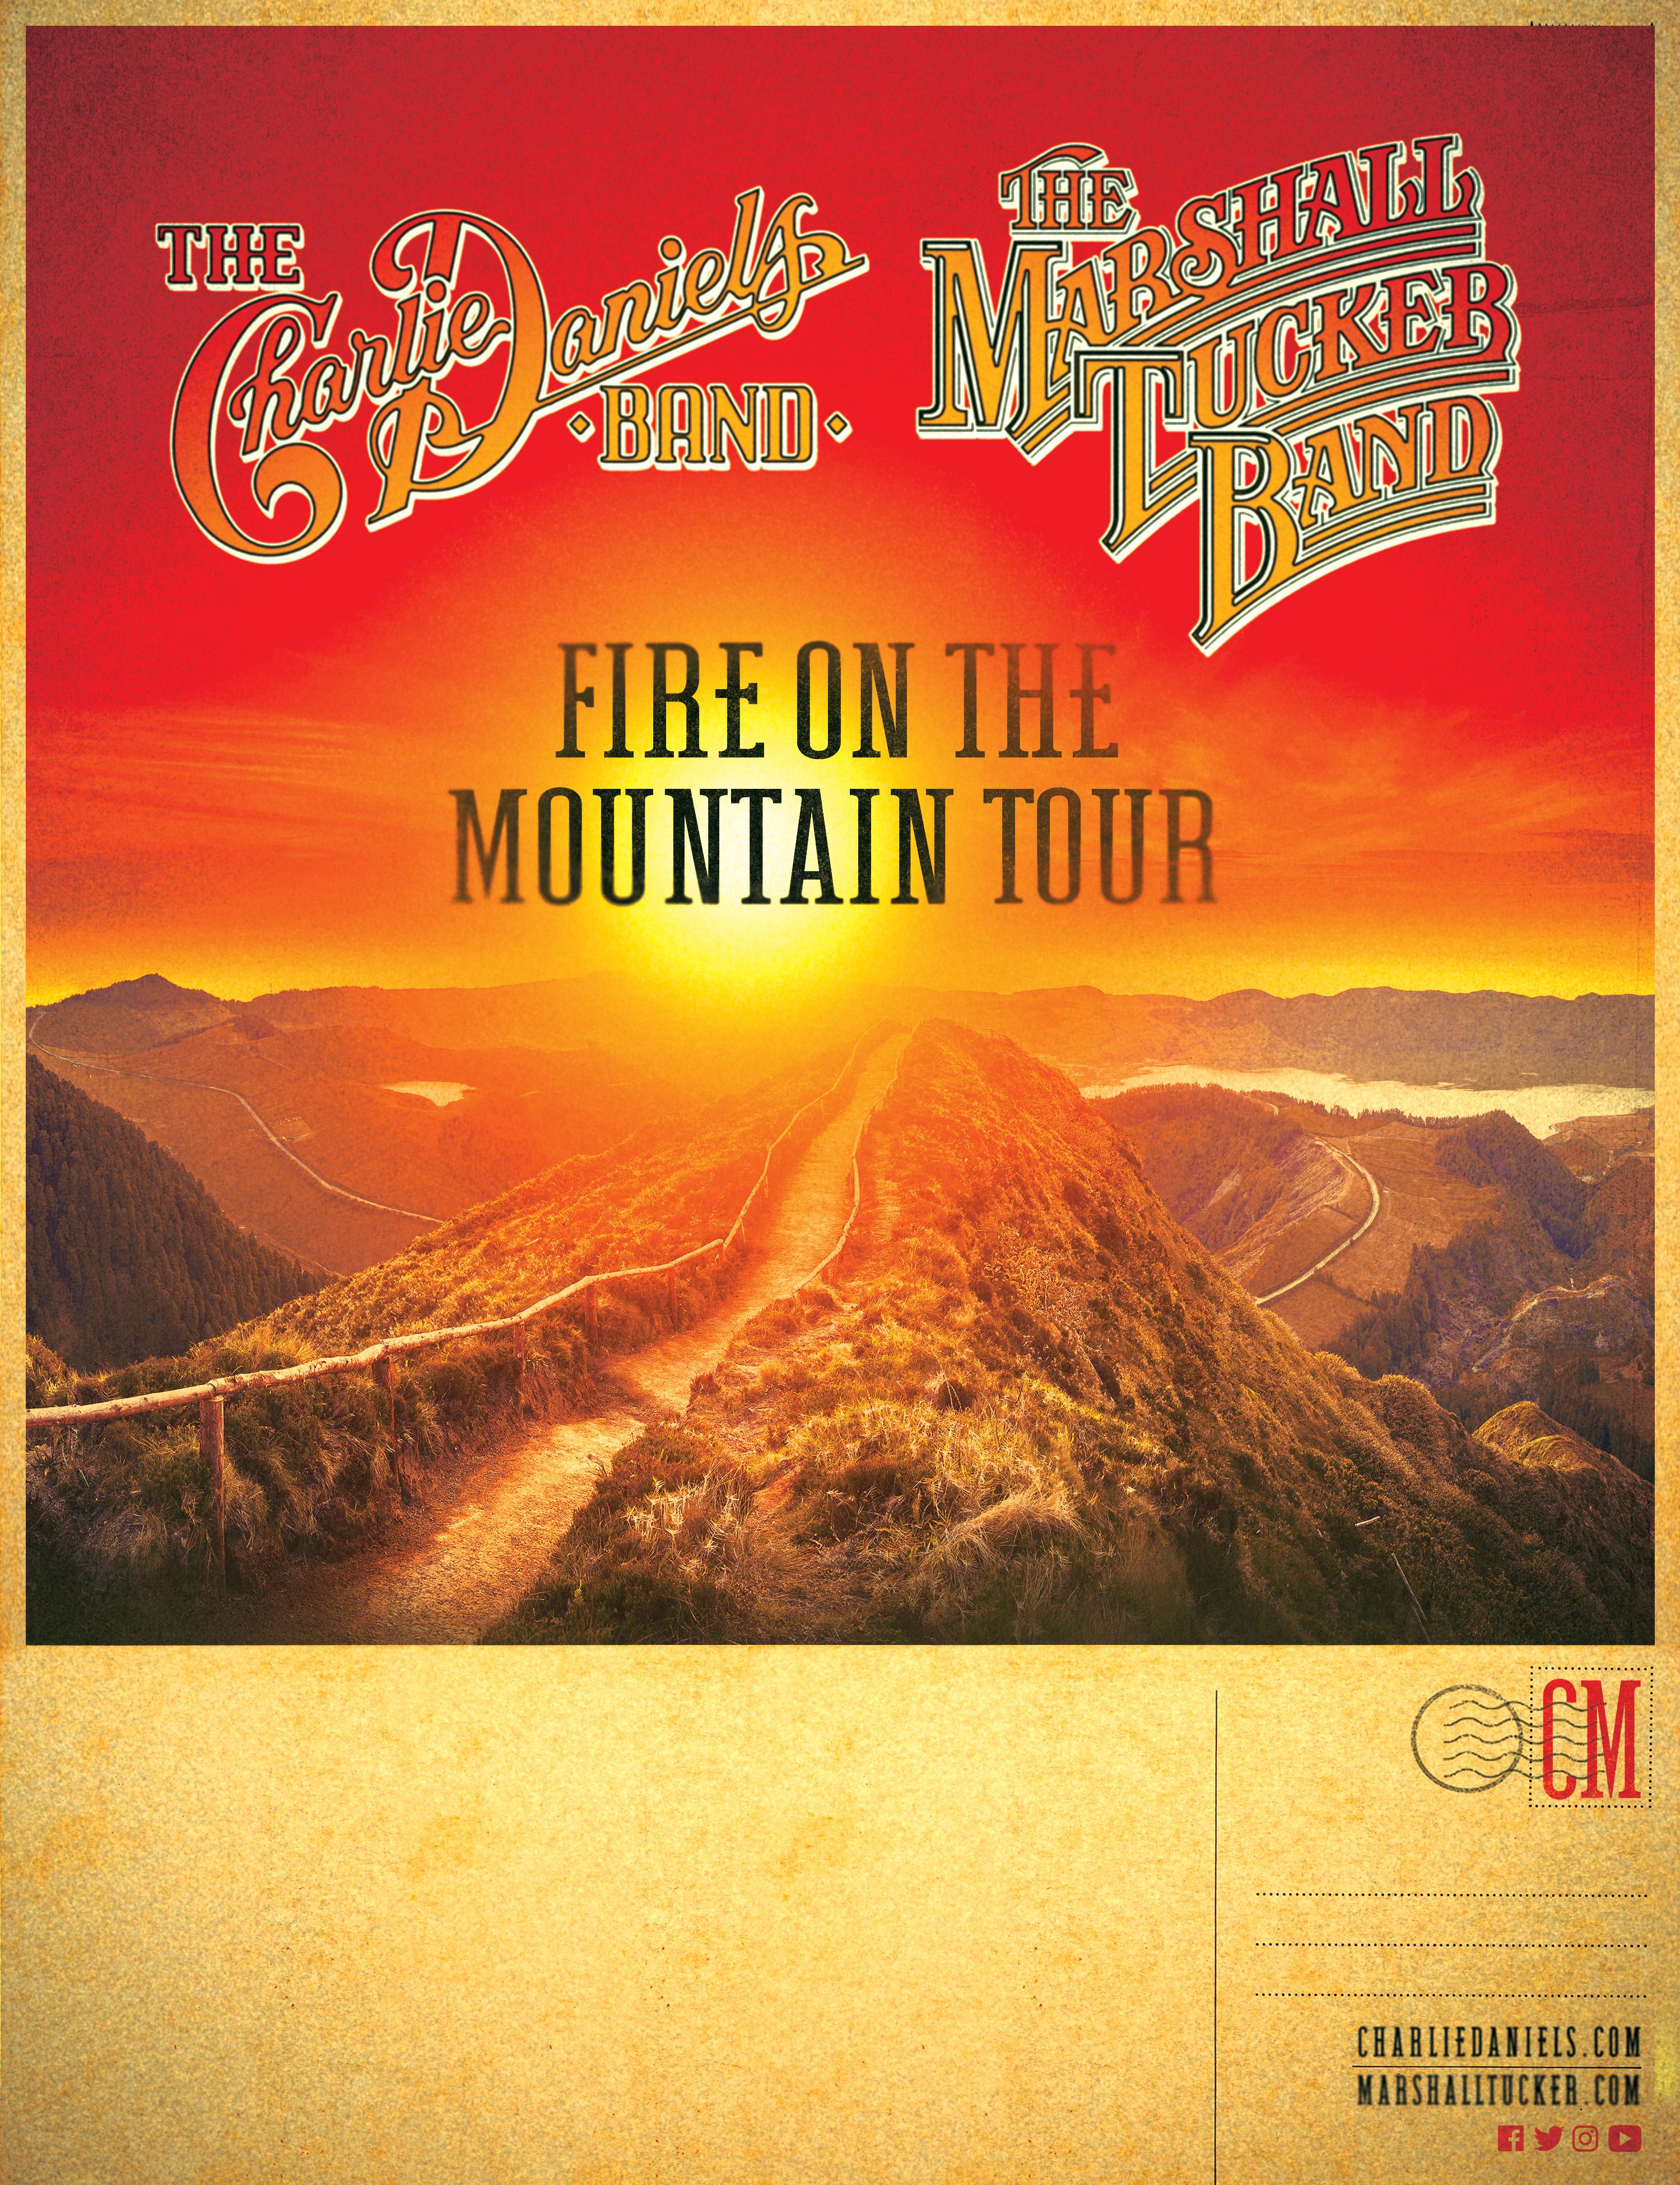 Charlie Daniels Band, Marshall Tucker Band to Charleston tour stop